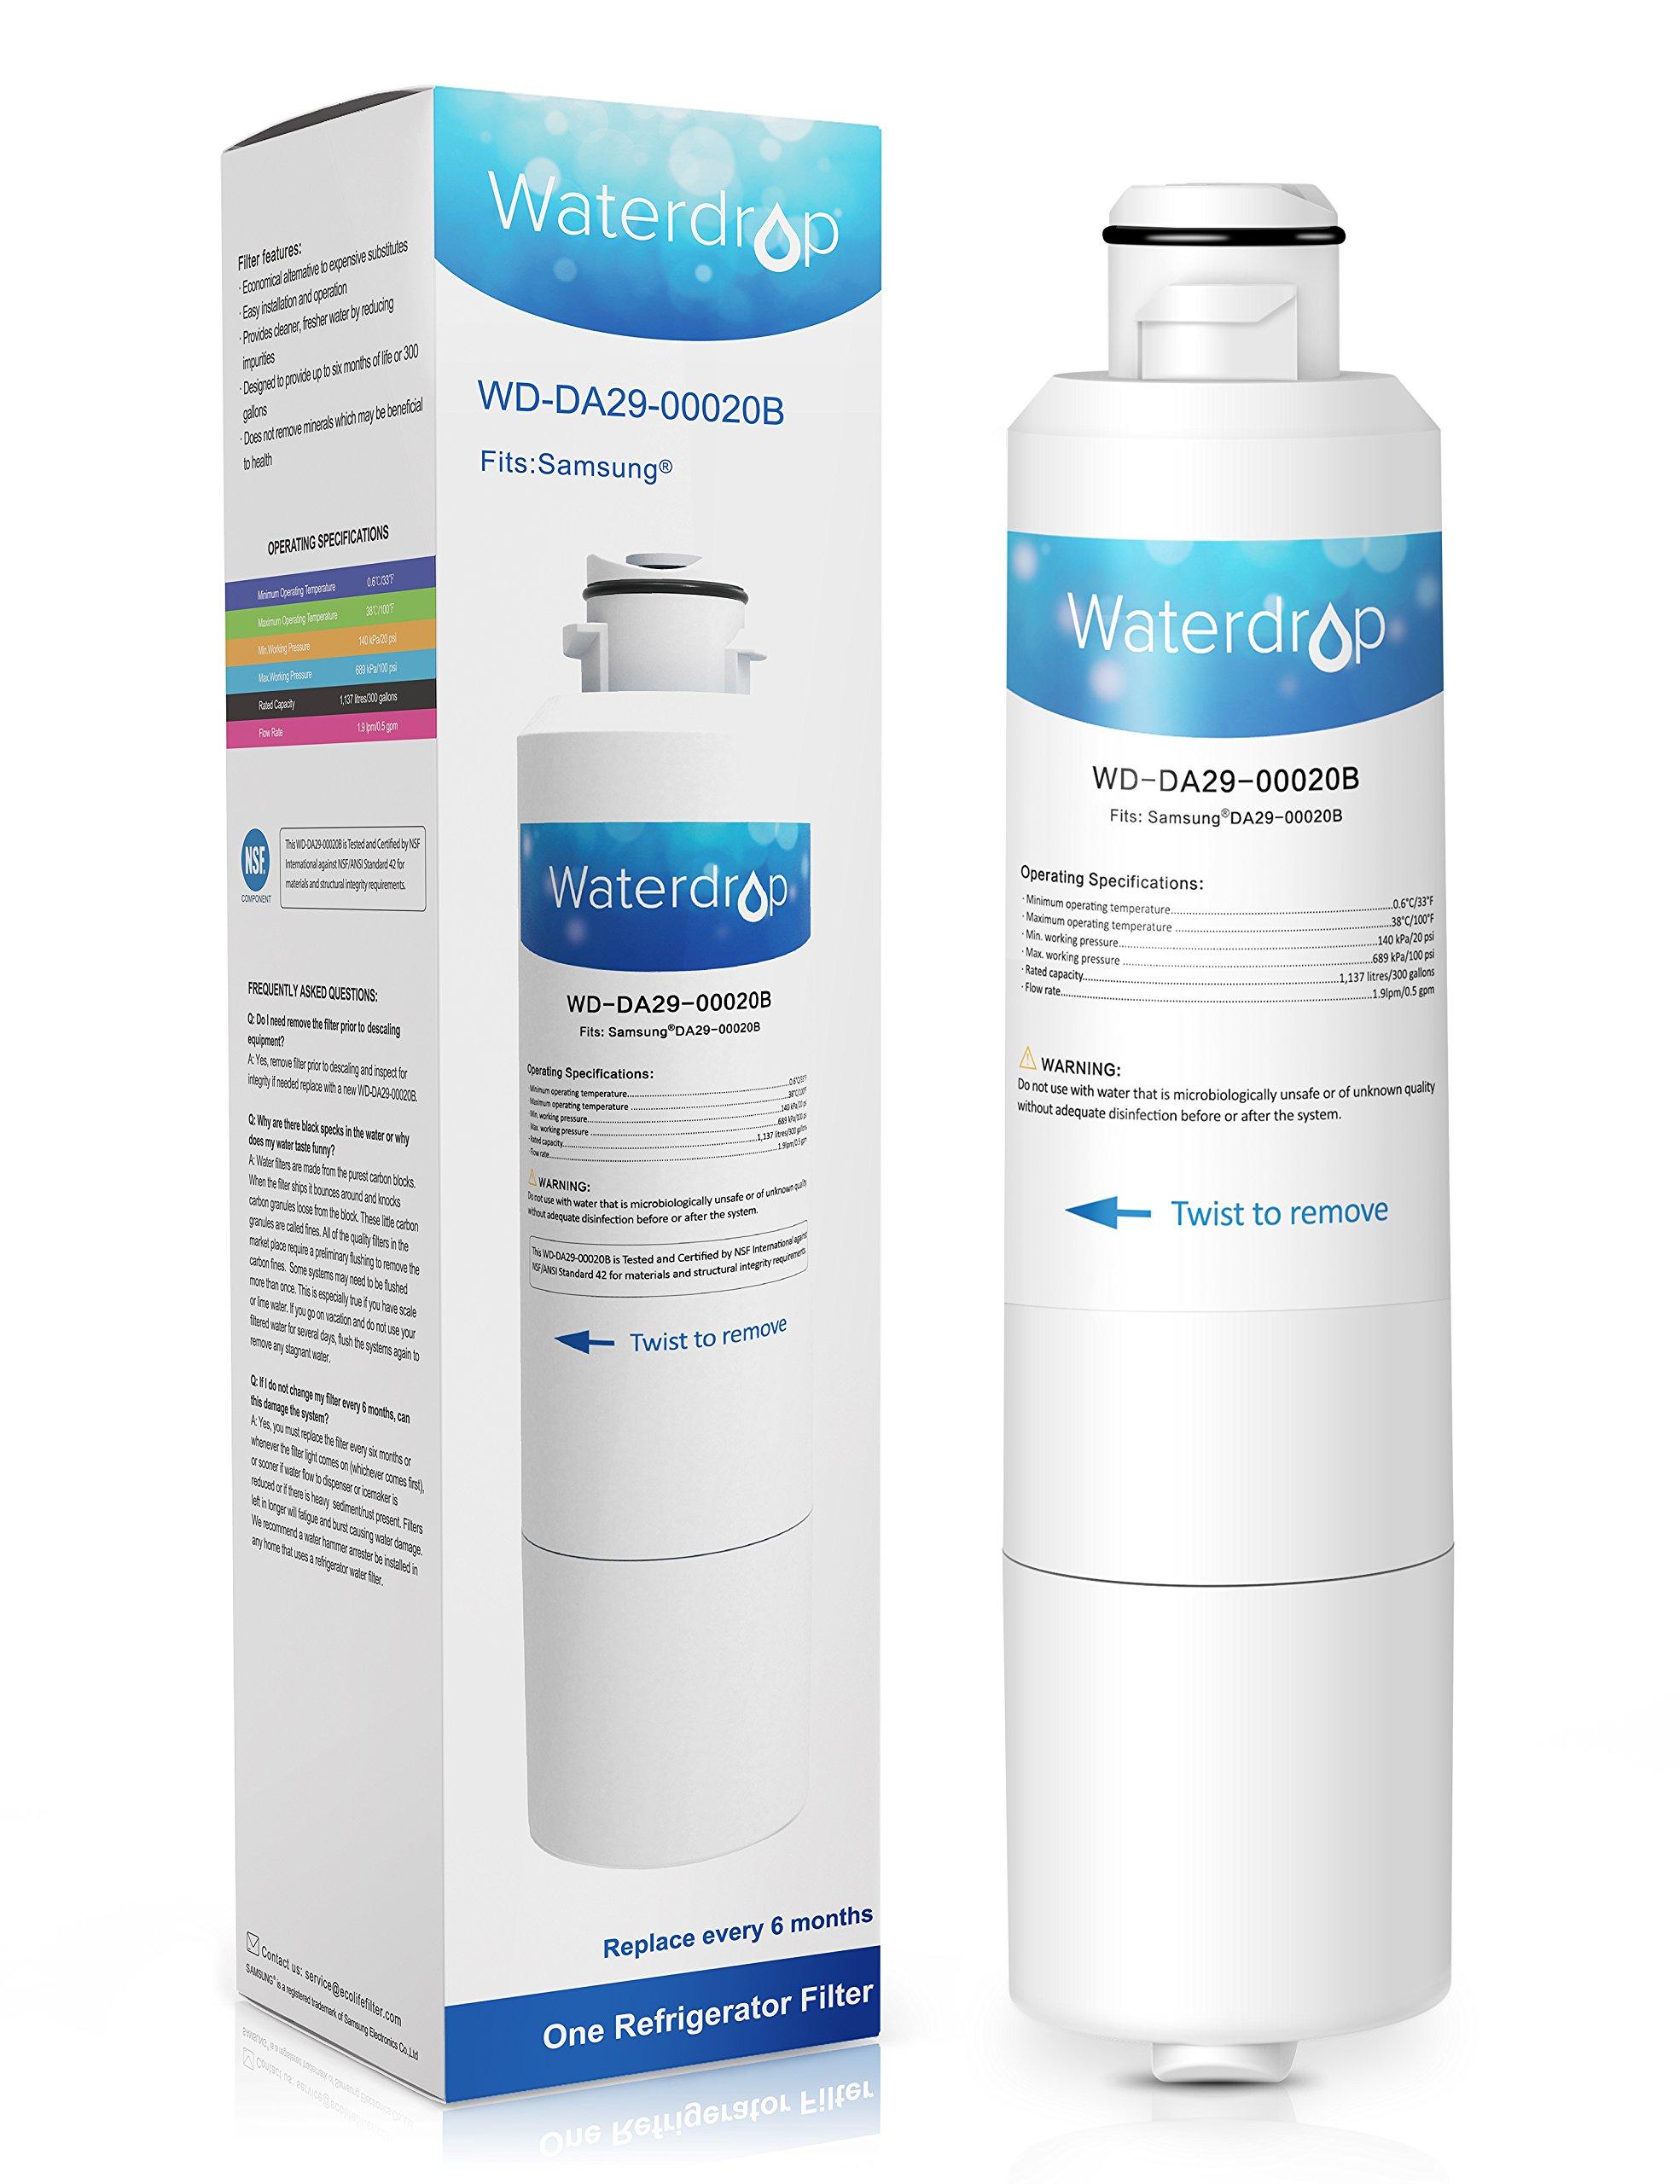 Waterdrop DA29-00020B Replacement for Samsung DA29-00020B, DA29-00020A, HAF-CIN/EXP, 46-9101 Refrigerator Water Filter